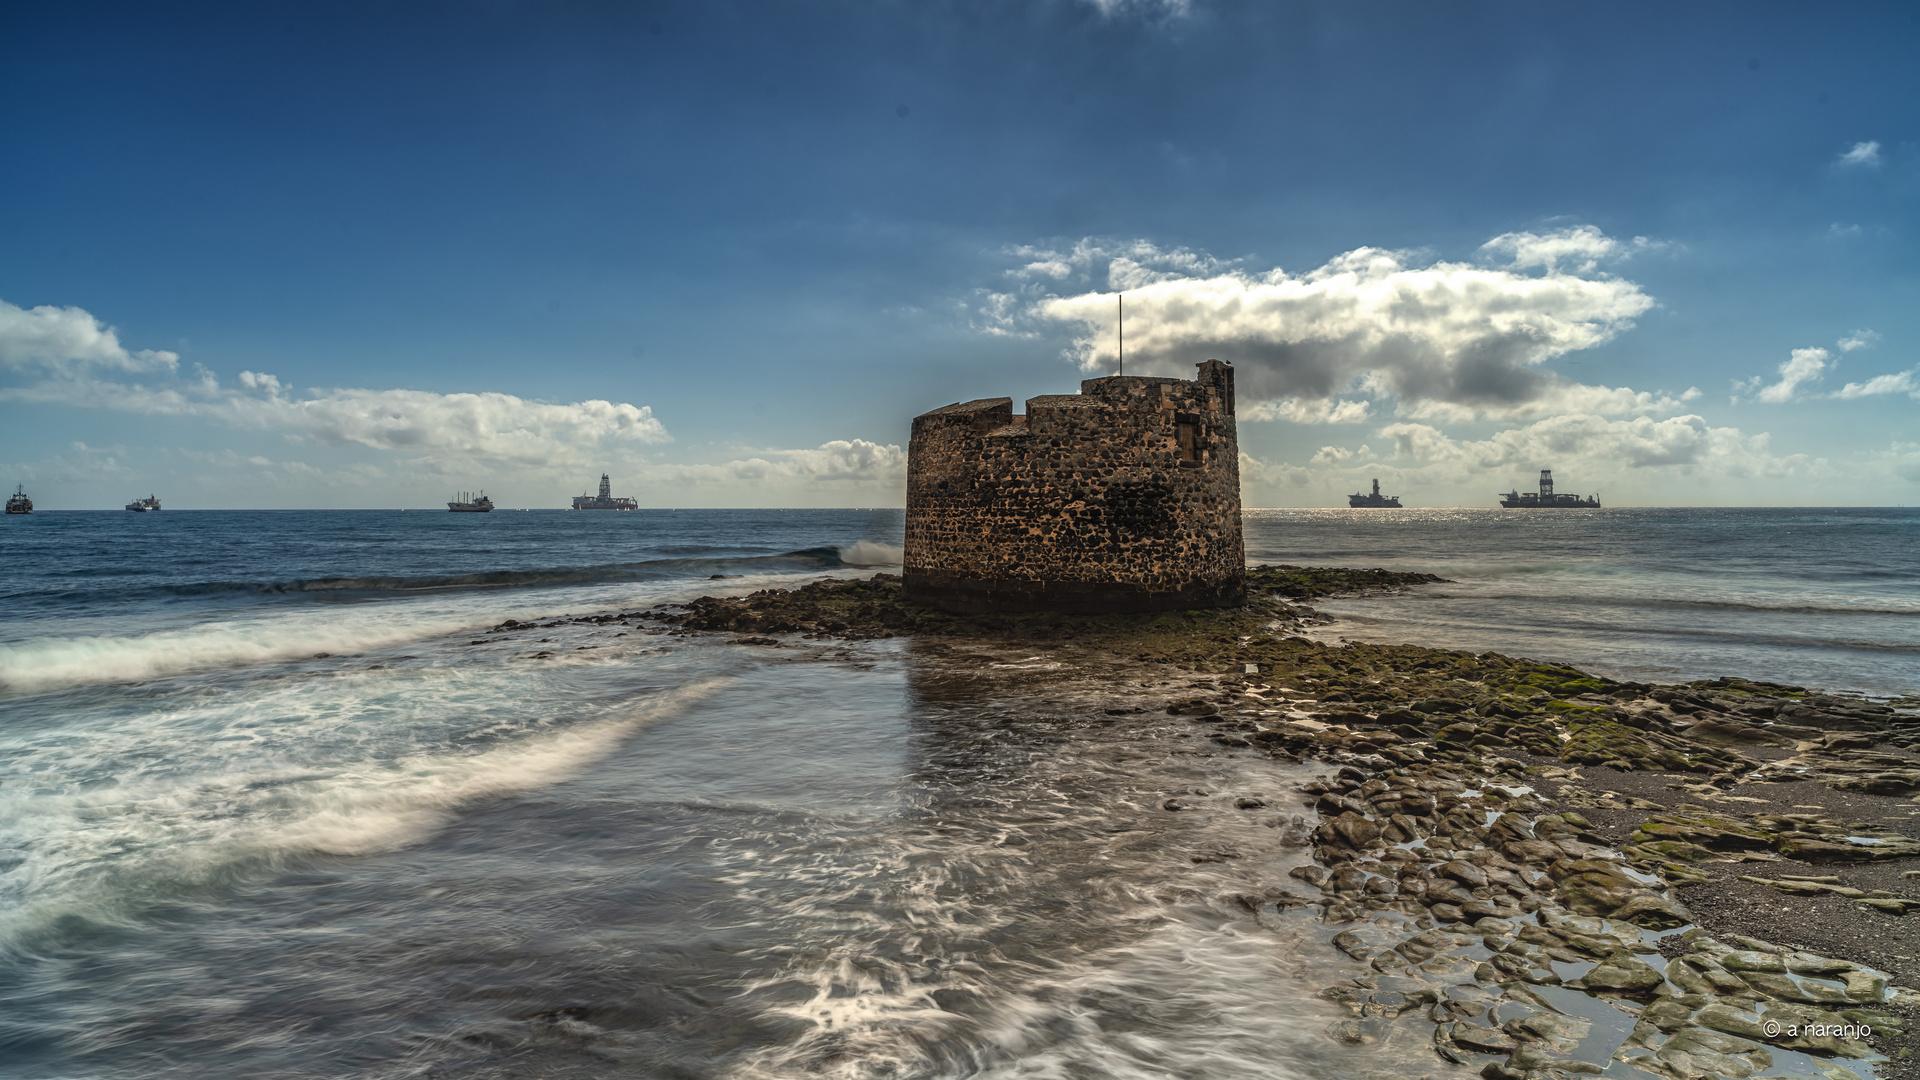 EL FORTIN DE SAN CRISTOBAL -GRAN CANARIA